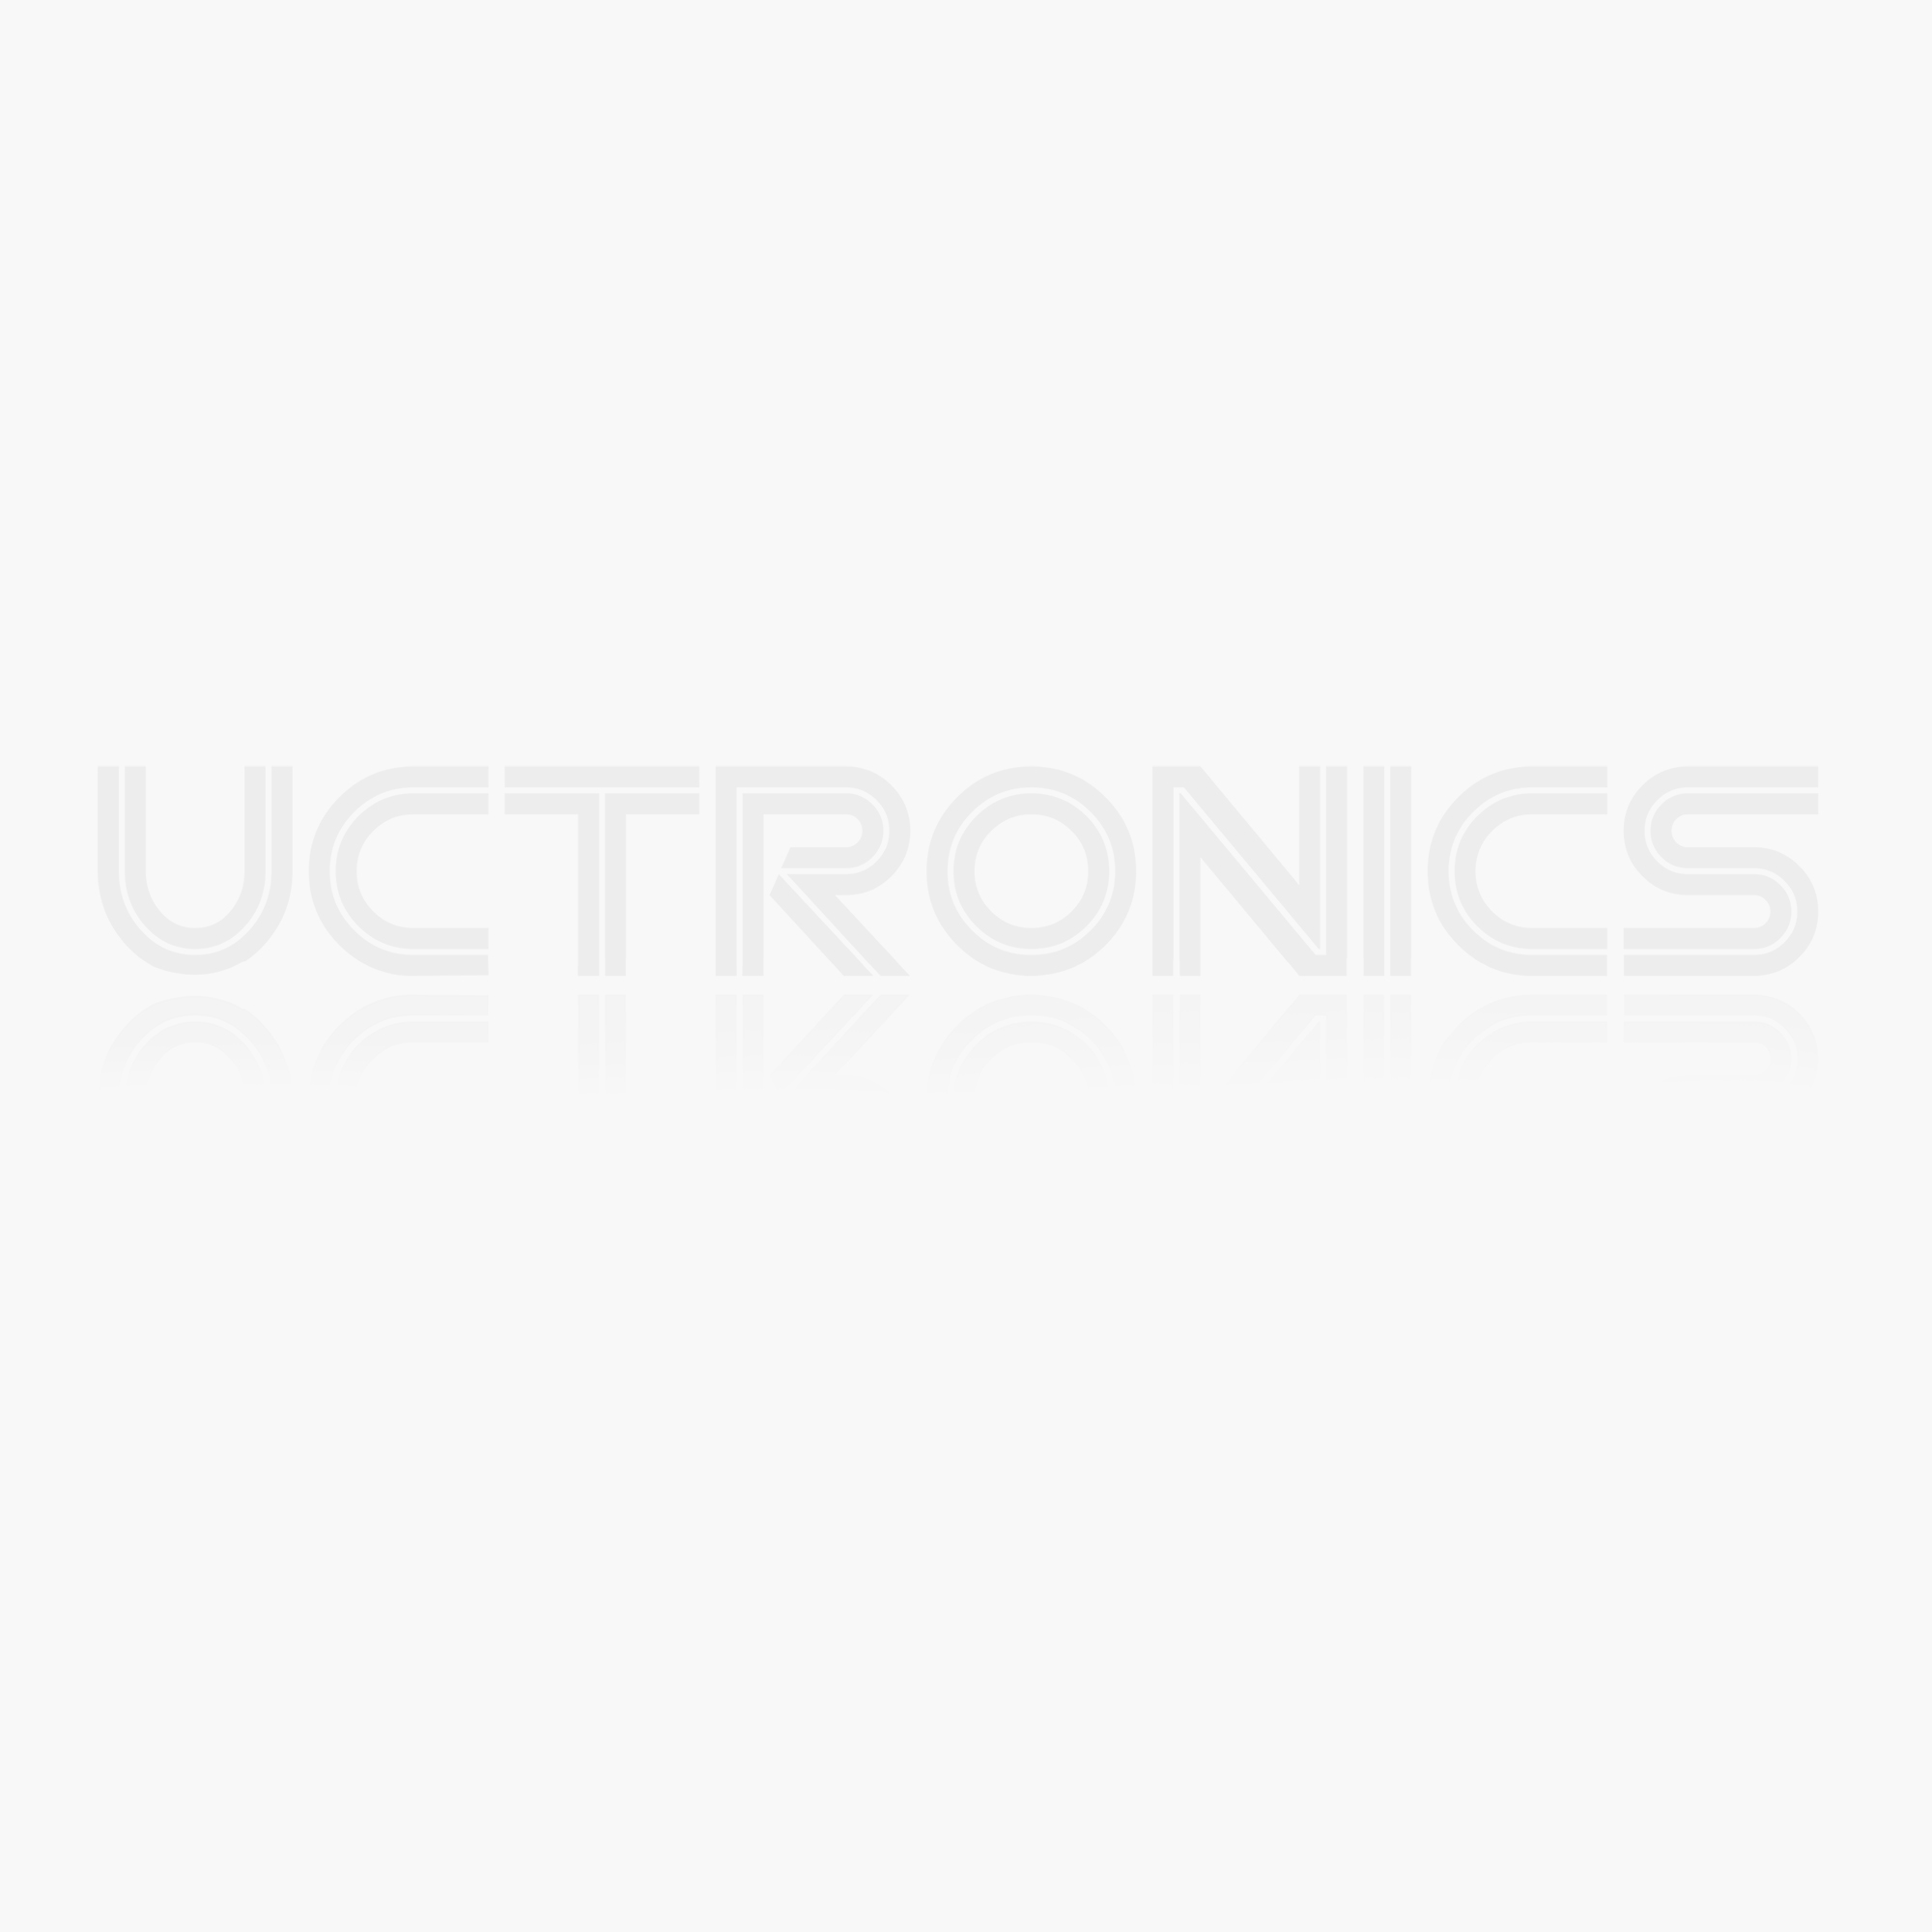 100pcs 6*8cm Plastic Zip Lock Ziplock Clear Transparent Resealable Bag #2